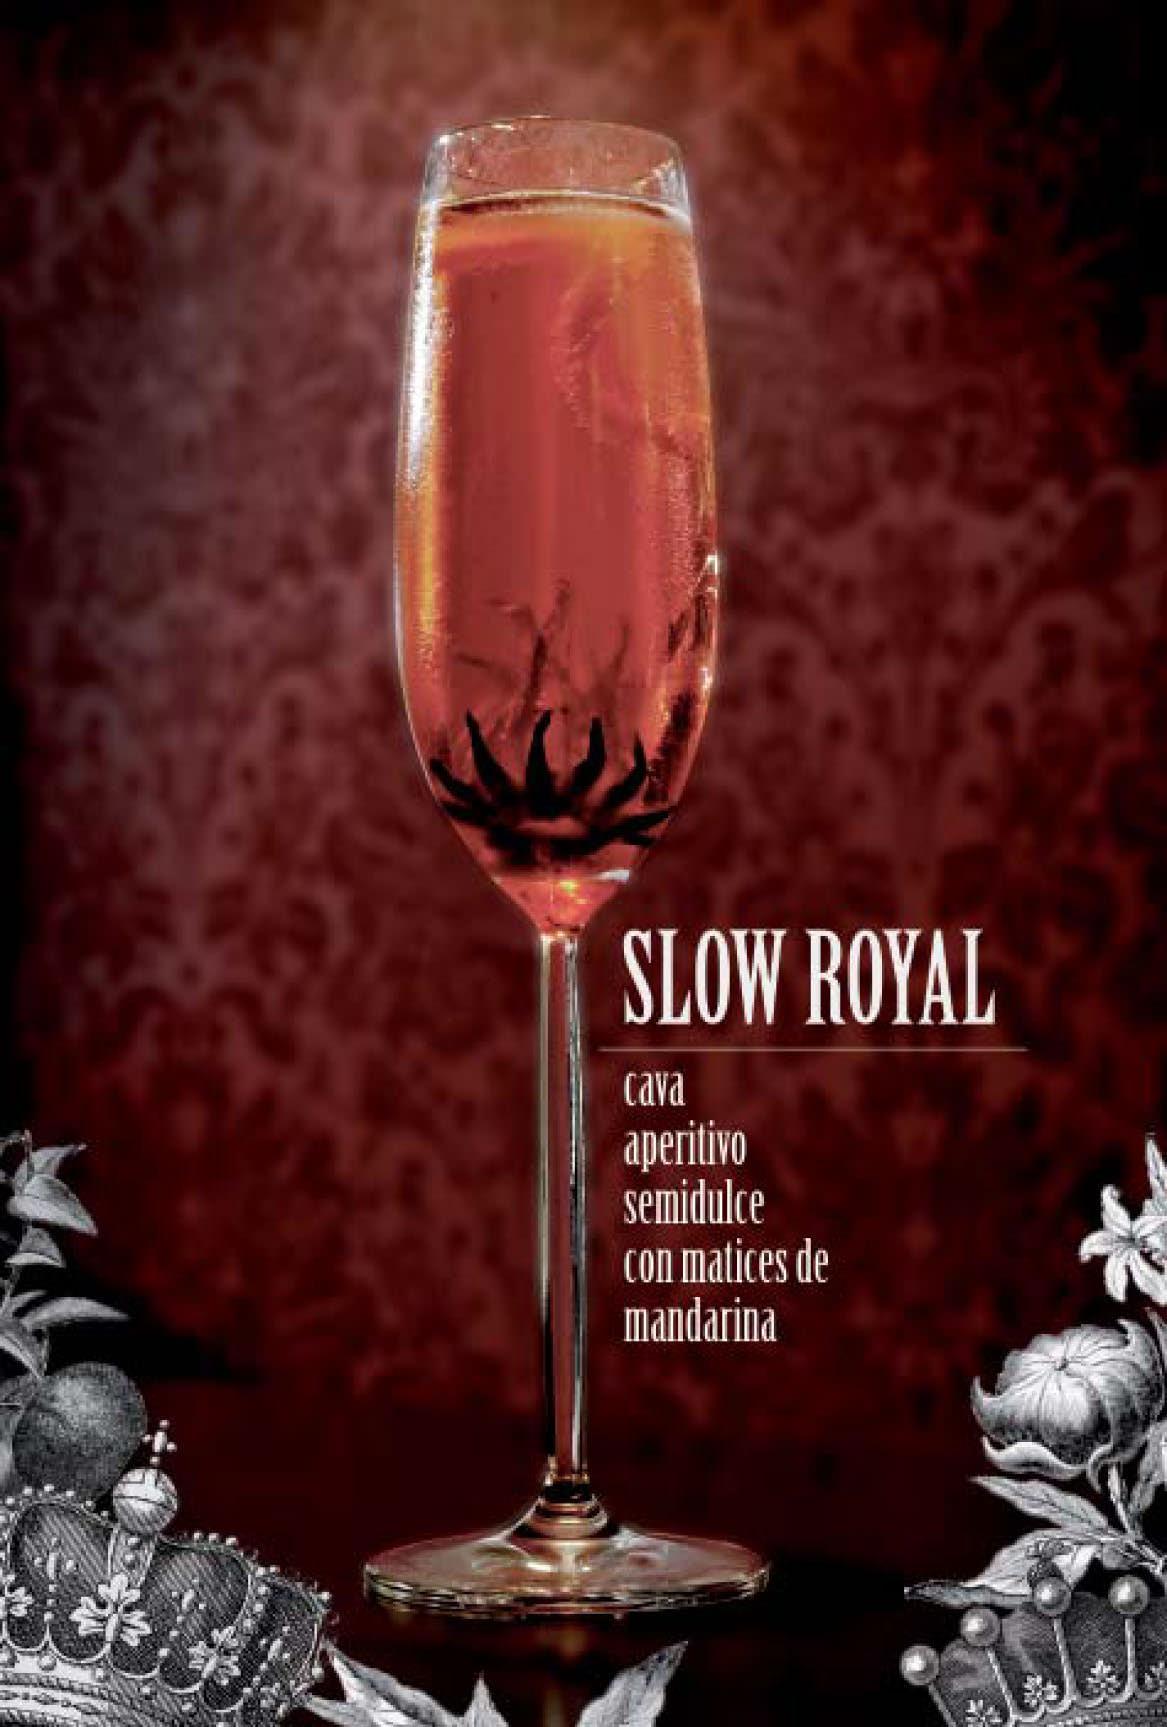 Slow Royal